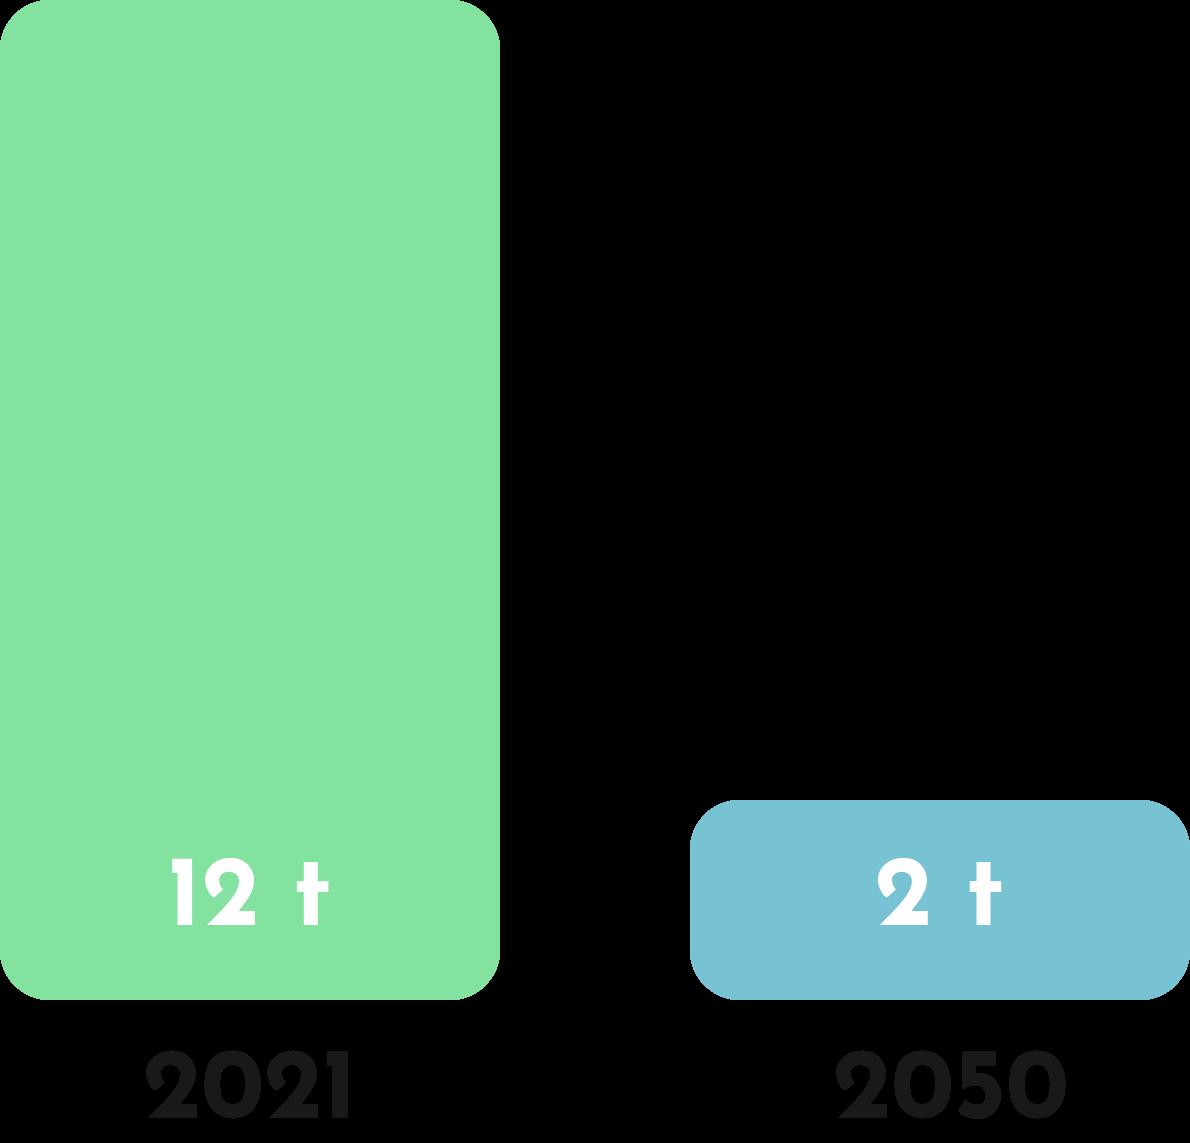 empreinte carbone, objectif 2050